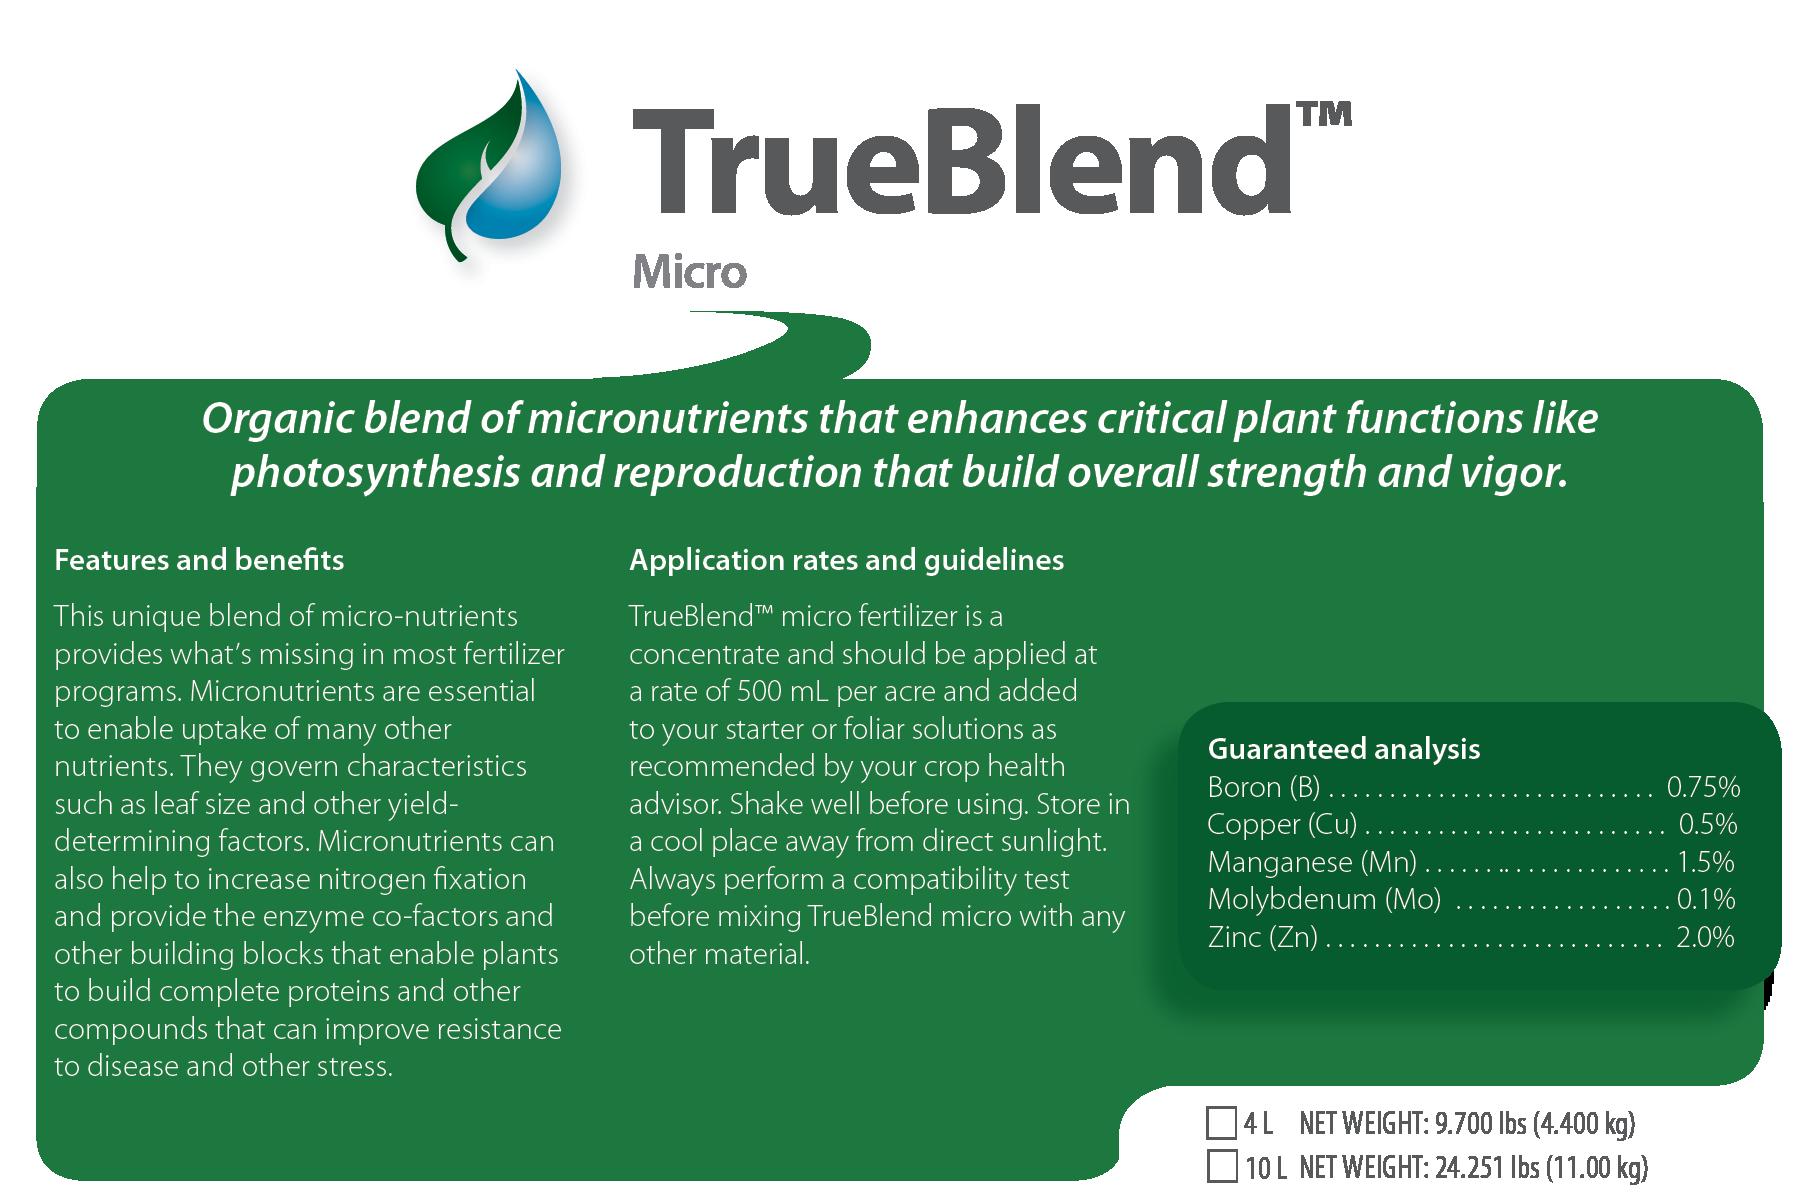 TrueBlend™ Micro